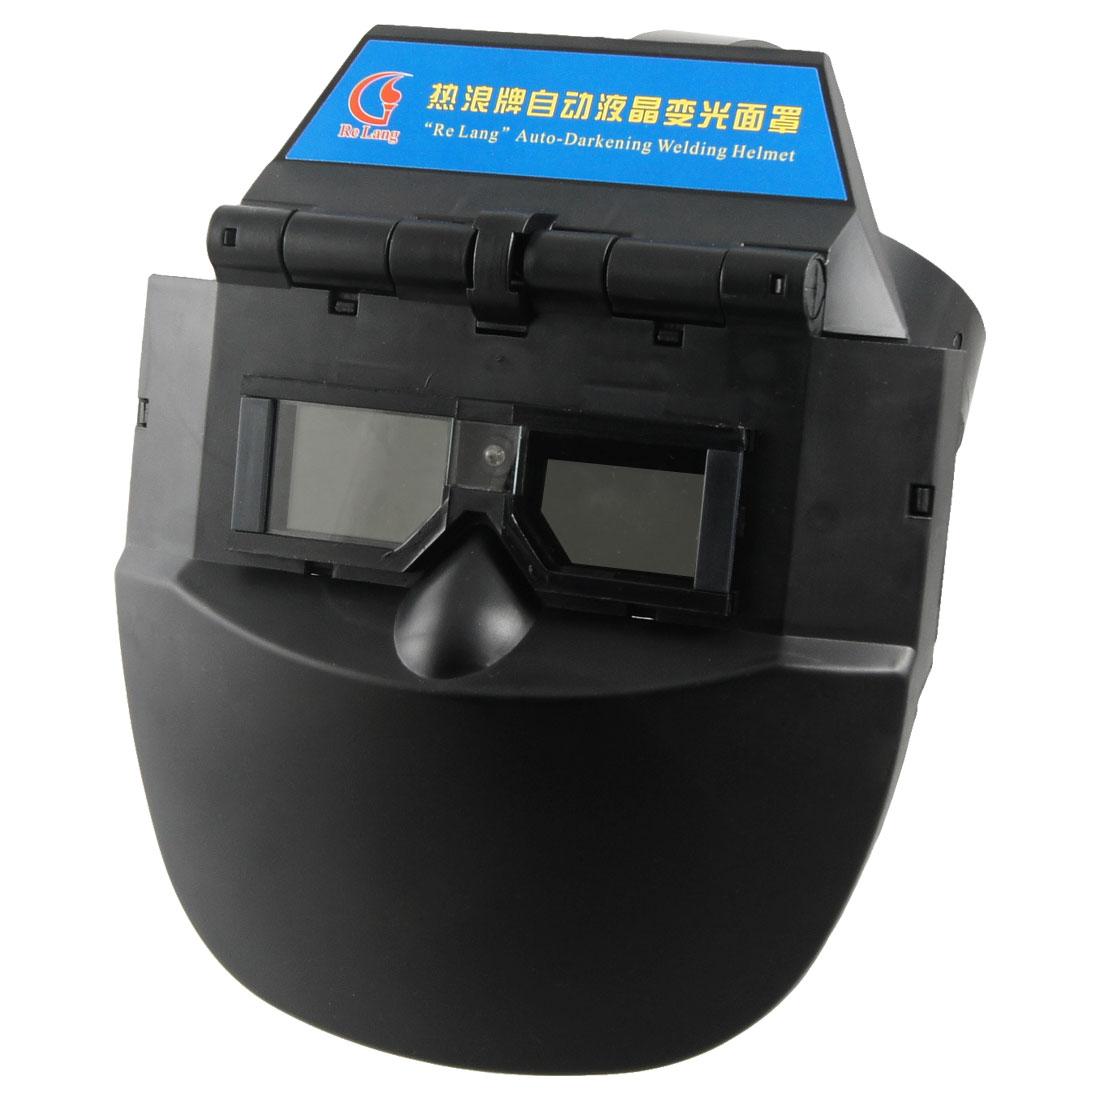 Black Plastic Auto Darkening Welding Helmet Mask Face Protector for Welder